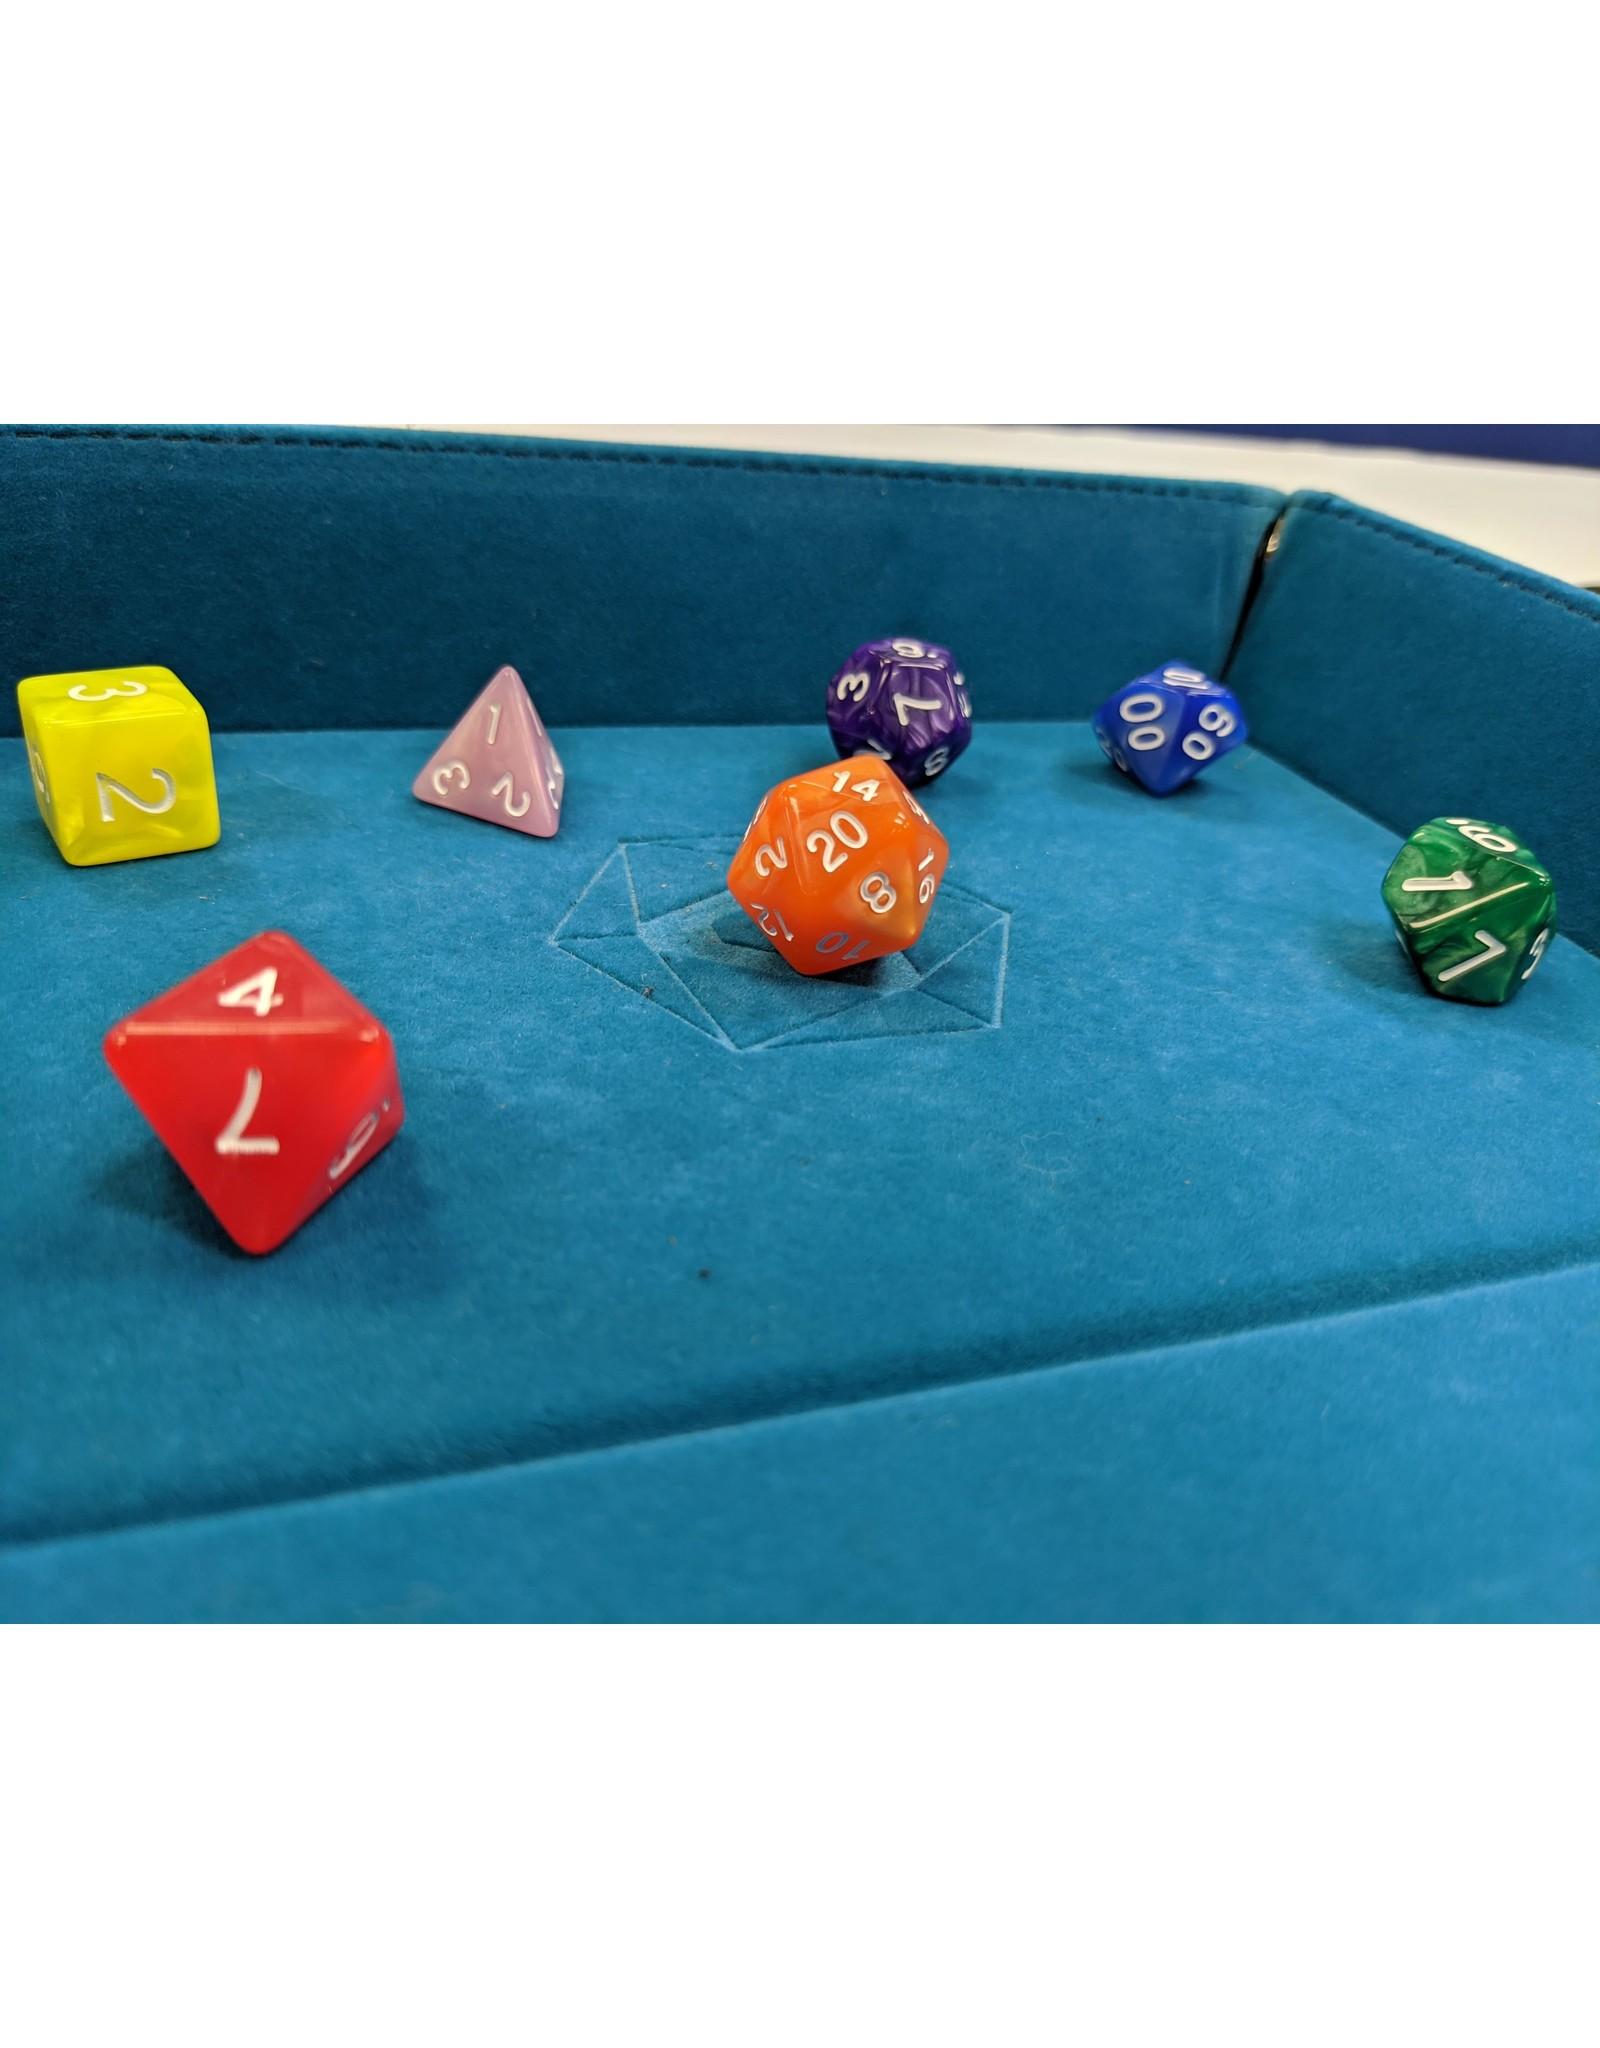 DIE HARD DICE DIE HARD DICE POLYMER RPG RAINBOW SWIRL MIX